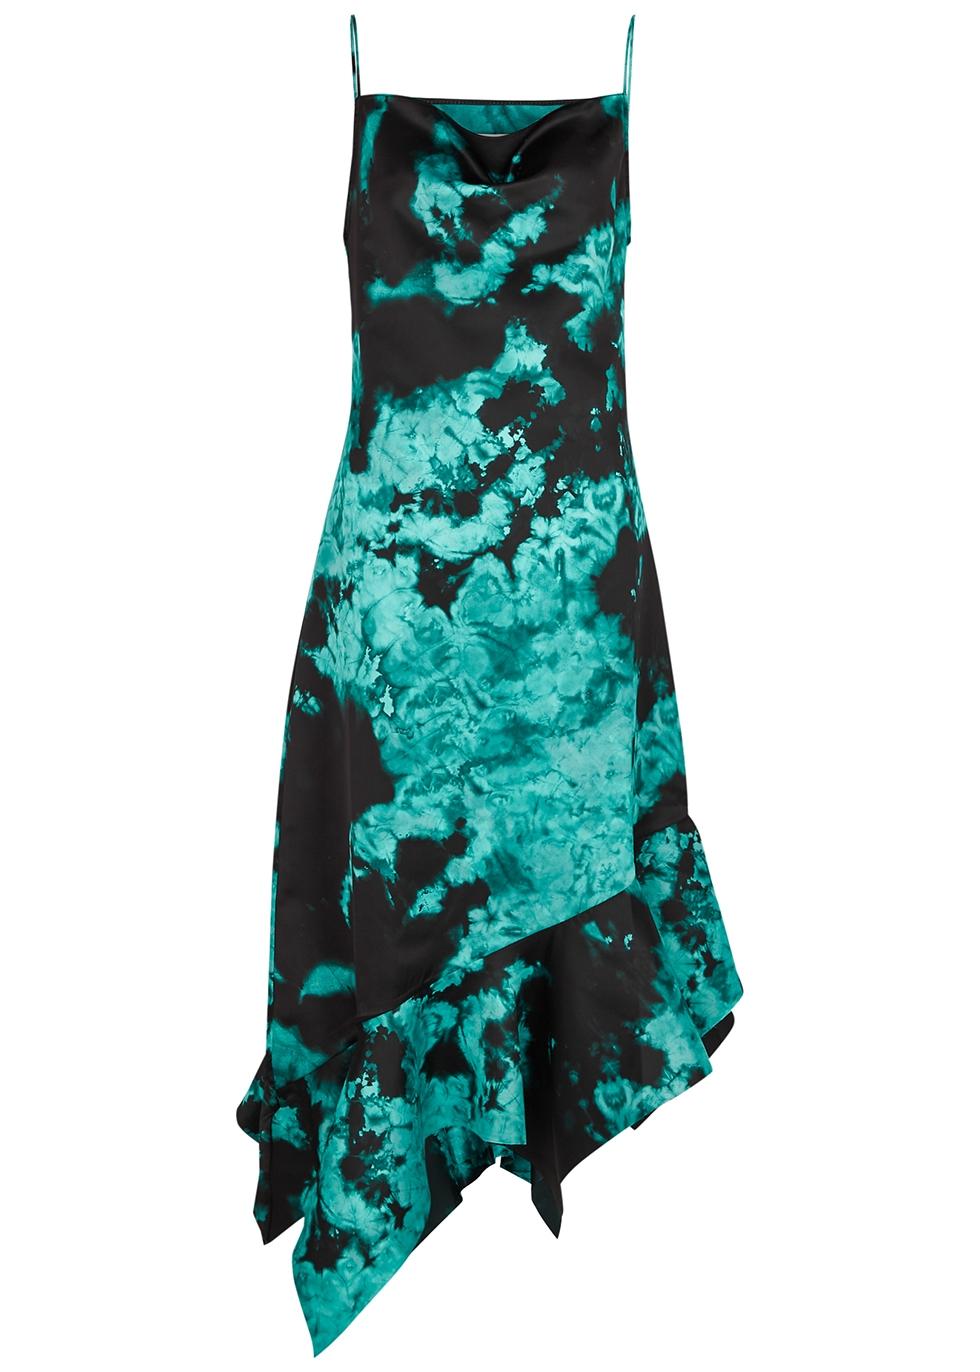 Tie-dyed satin midi dress